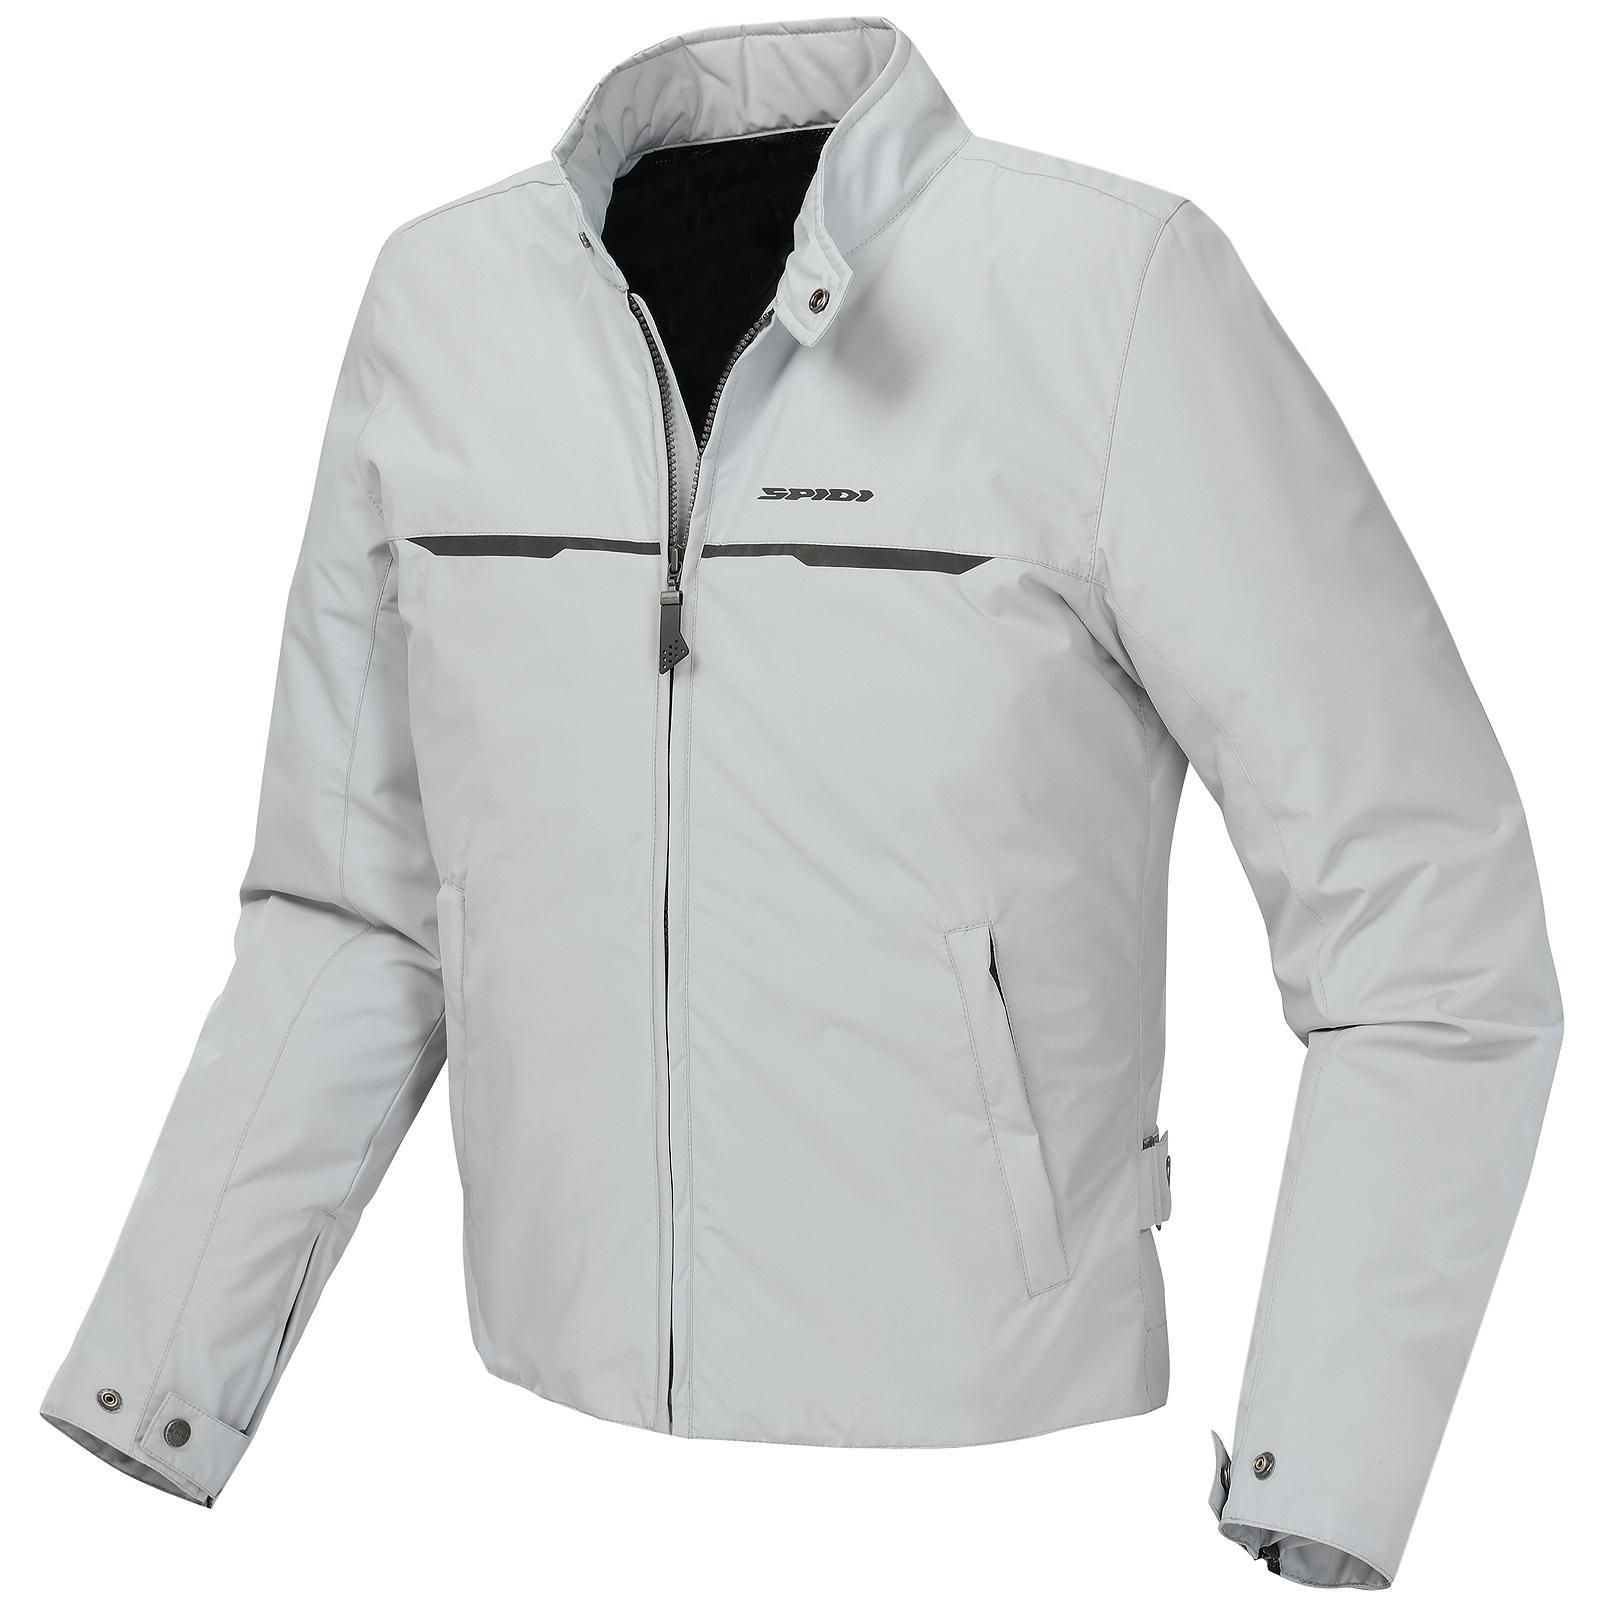 jacket dream meaning, dream about jacket, jacket dream interpretation, seeing in a dream jacket